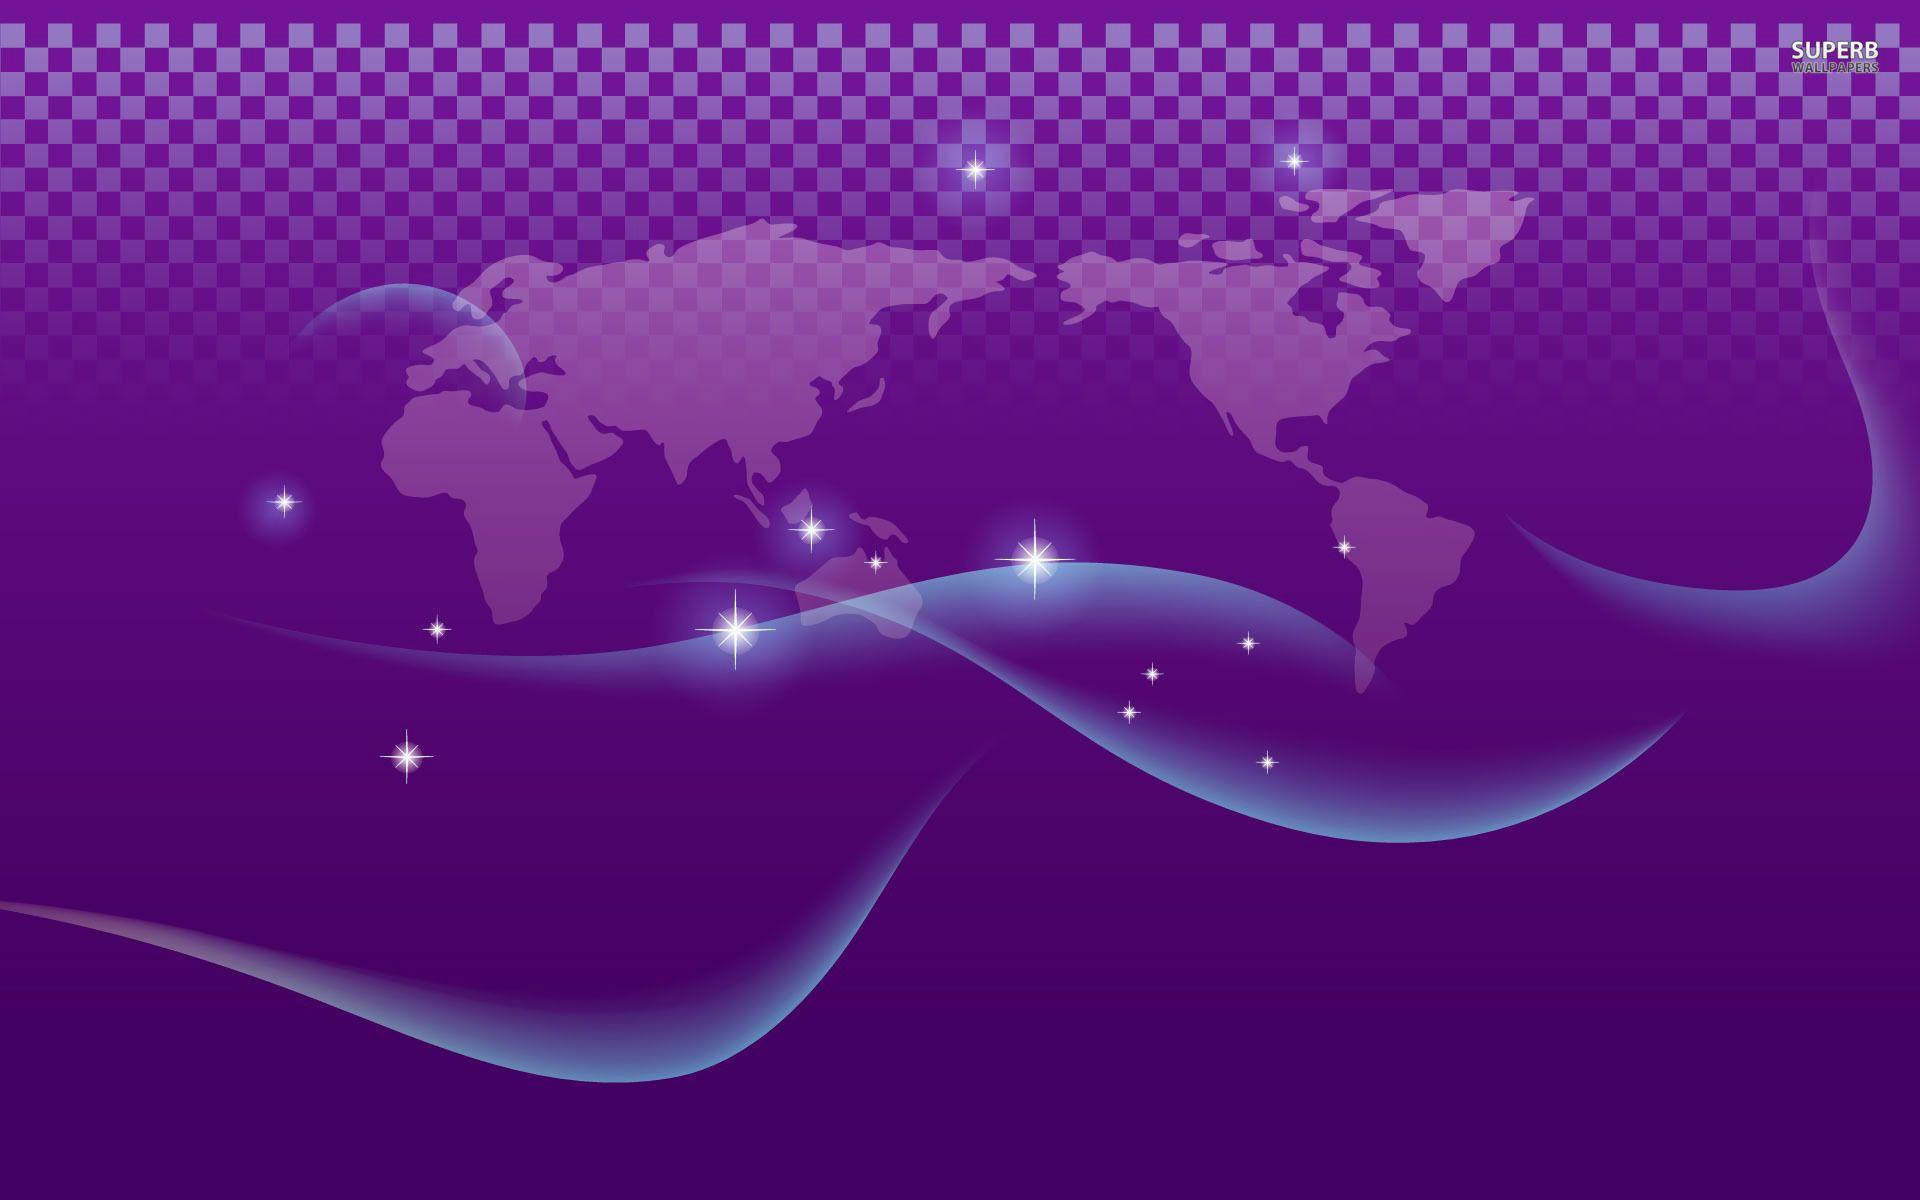 Waves on world map wallpaper 825649 purple pinterest purple waves on world map wallpaper 825649 gumiabroncs Choice Image